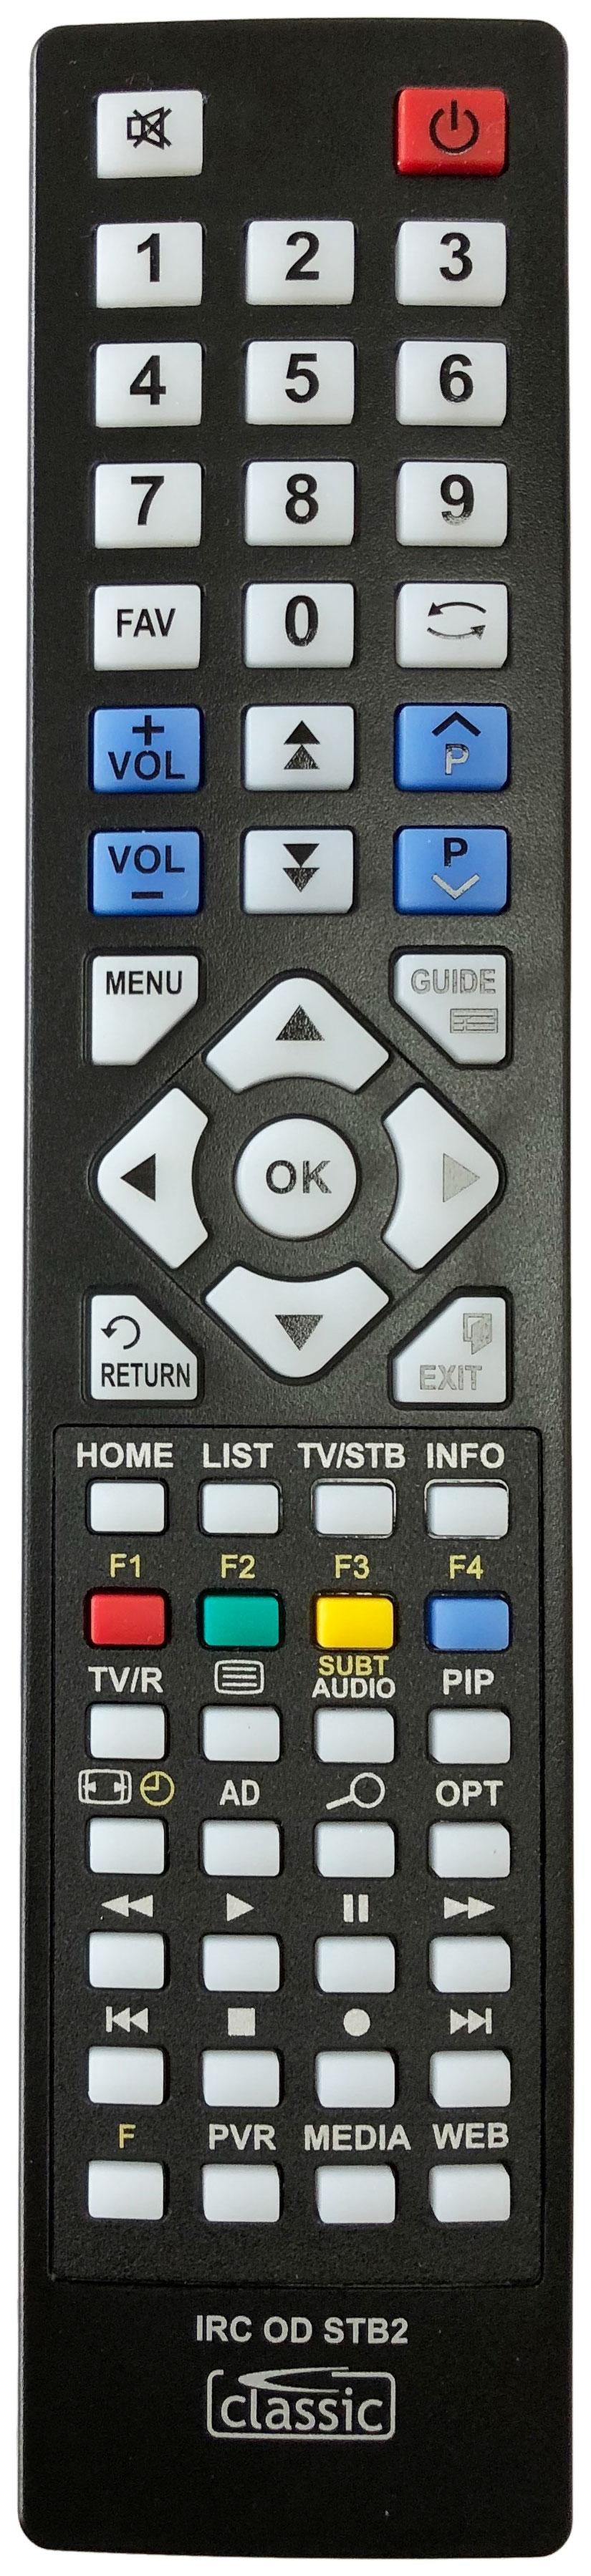 TVONICS RM-100 Remote Control